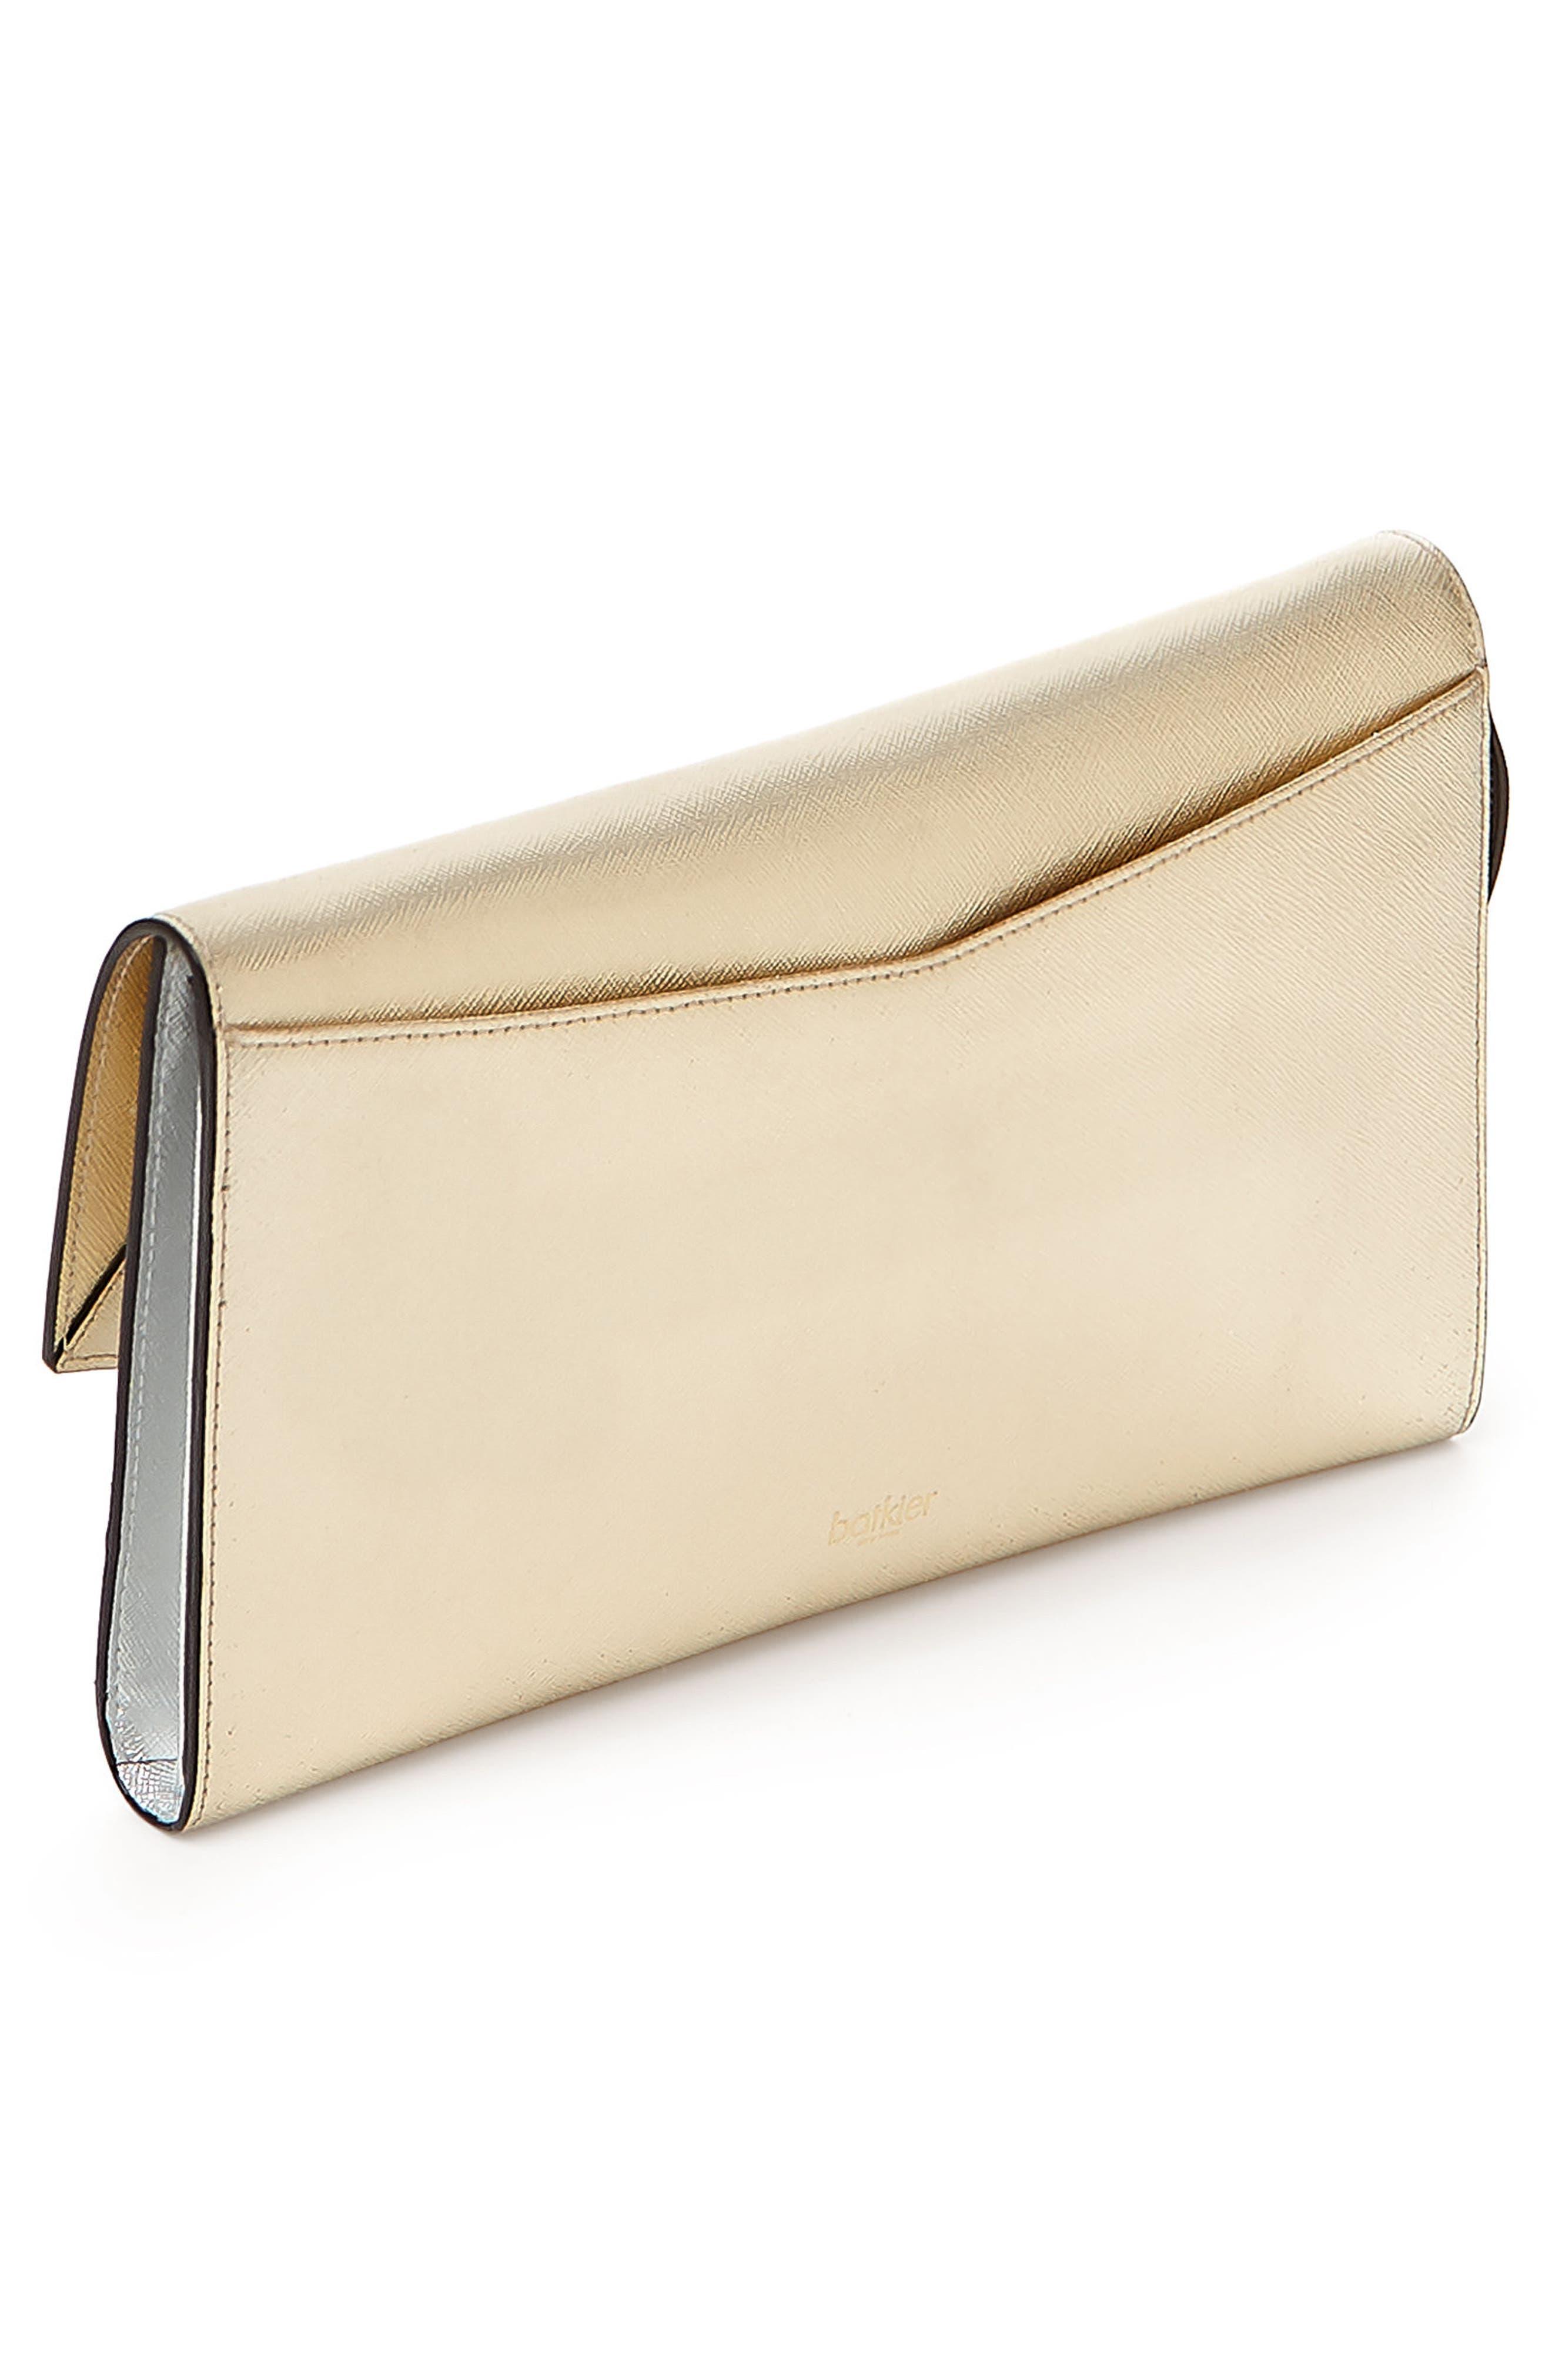 Cobble Hill Leather Wallet,                             Alternate thumbnail 2, color,                             GOLD COLORBLOCK